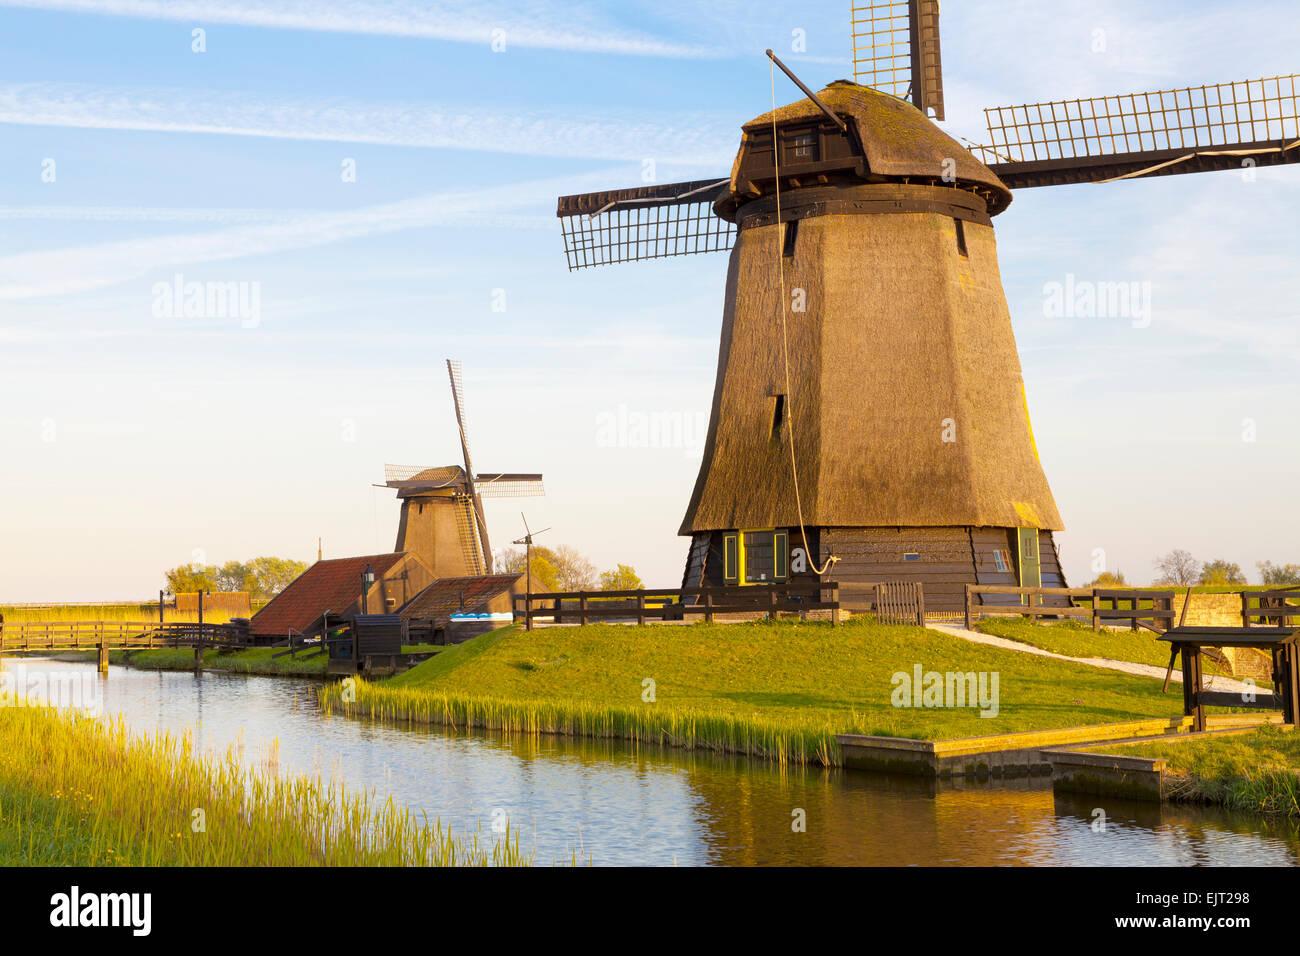 Traditional Windmills beside a Canal, Schermerhorn, North Holland, Netherlands - Stock Image